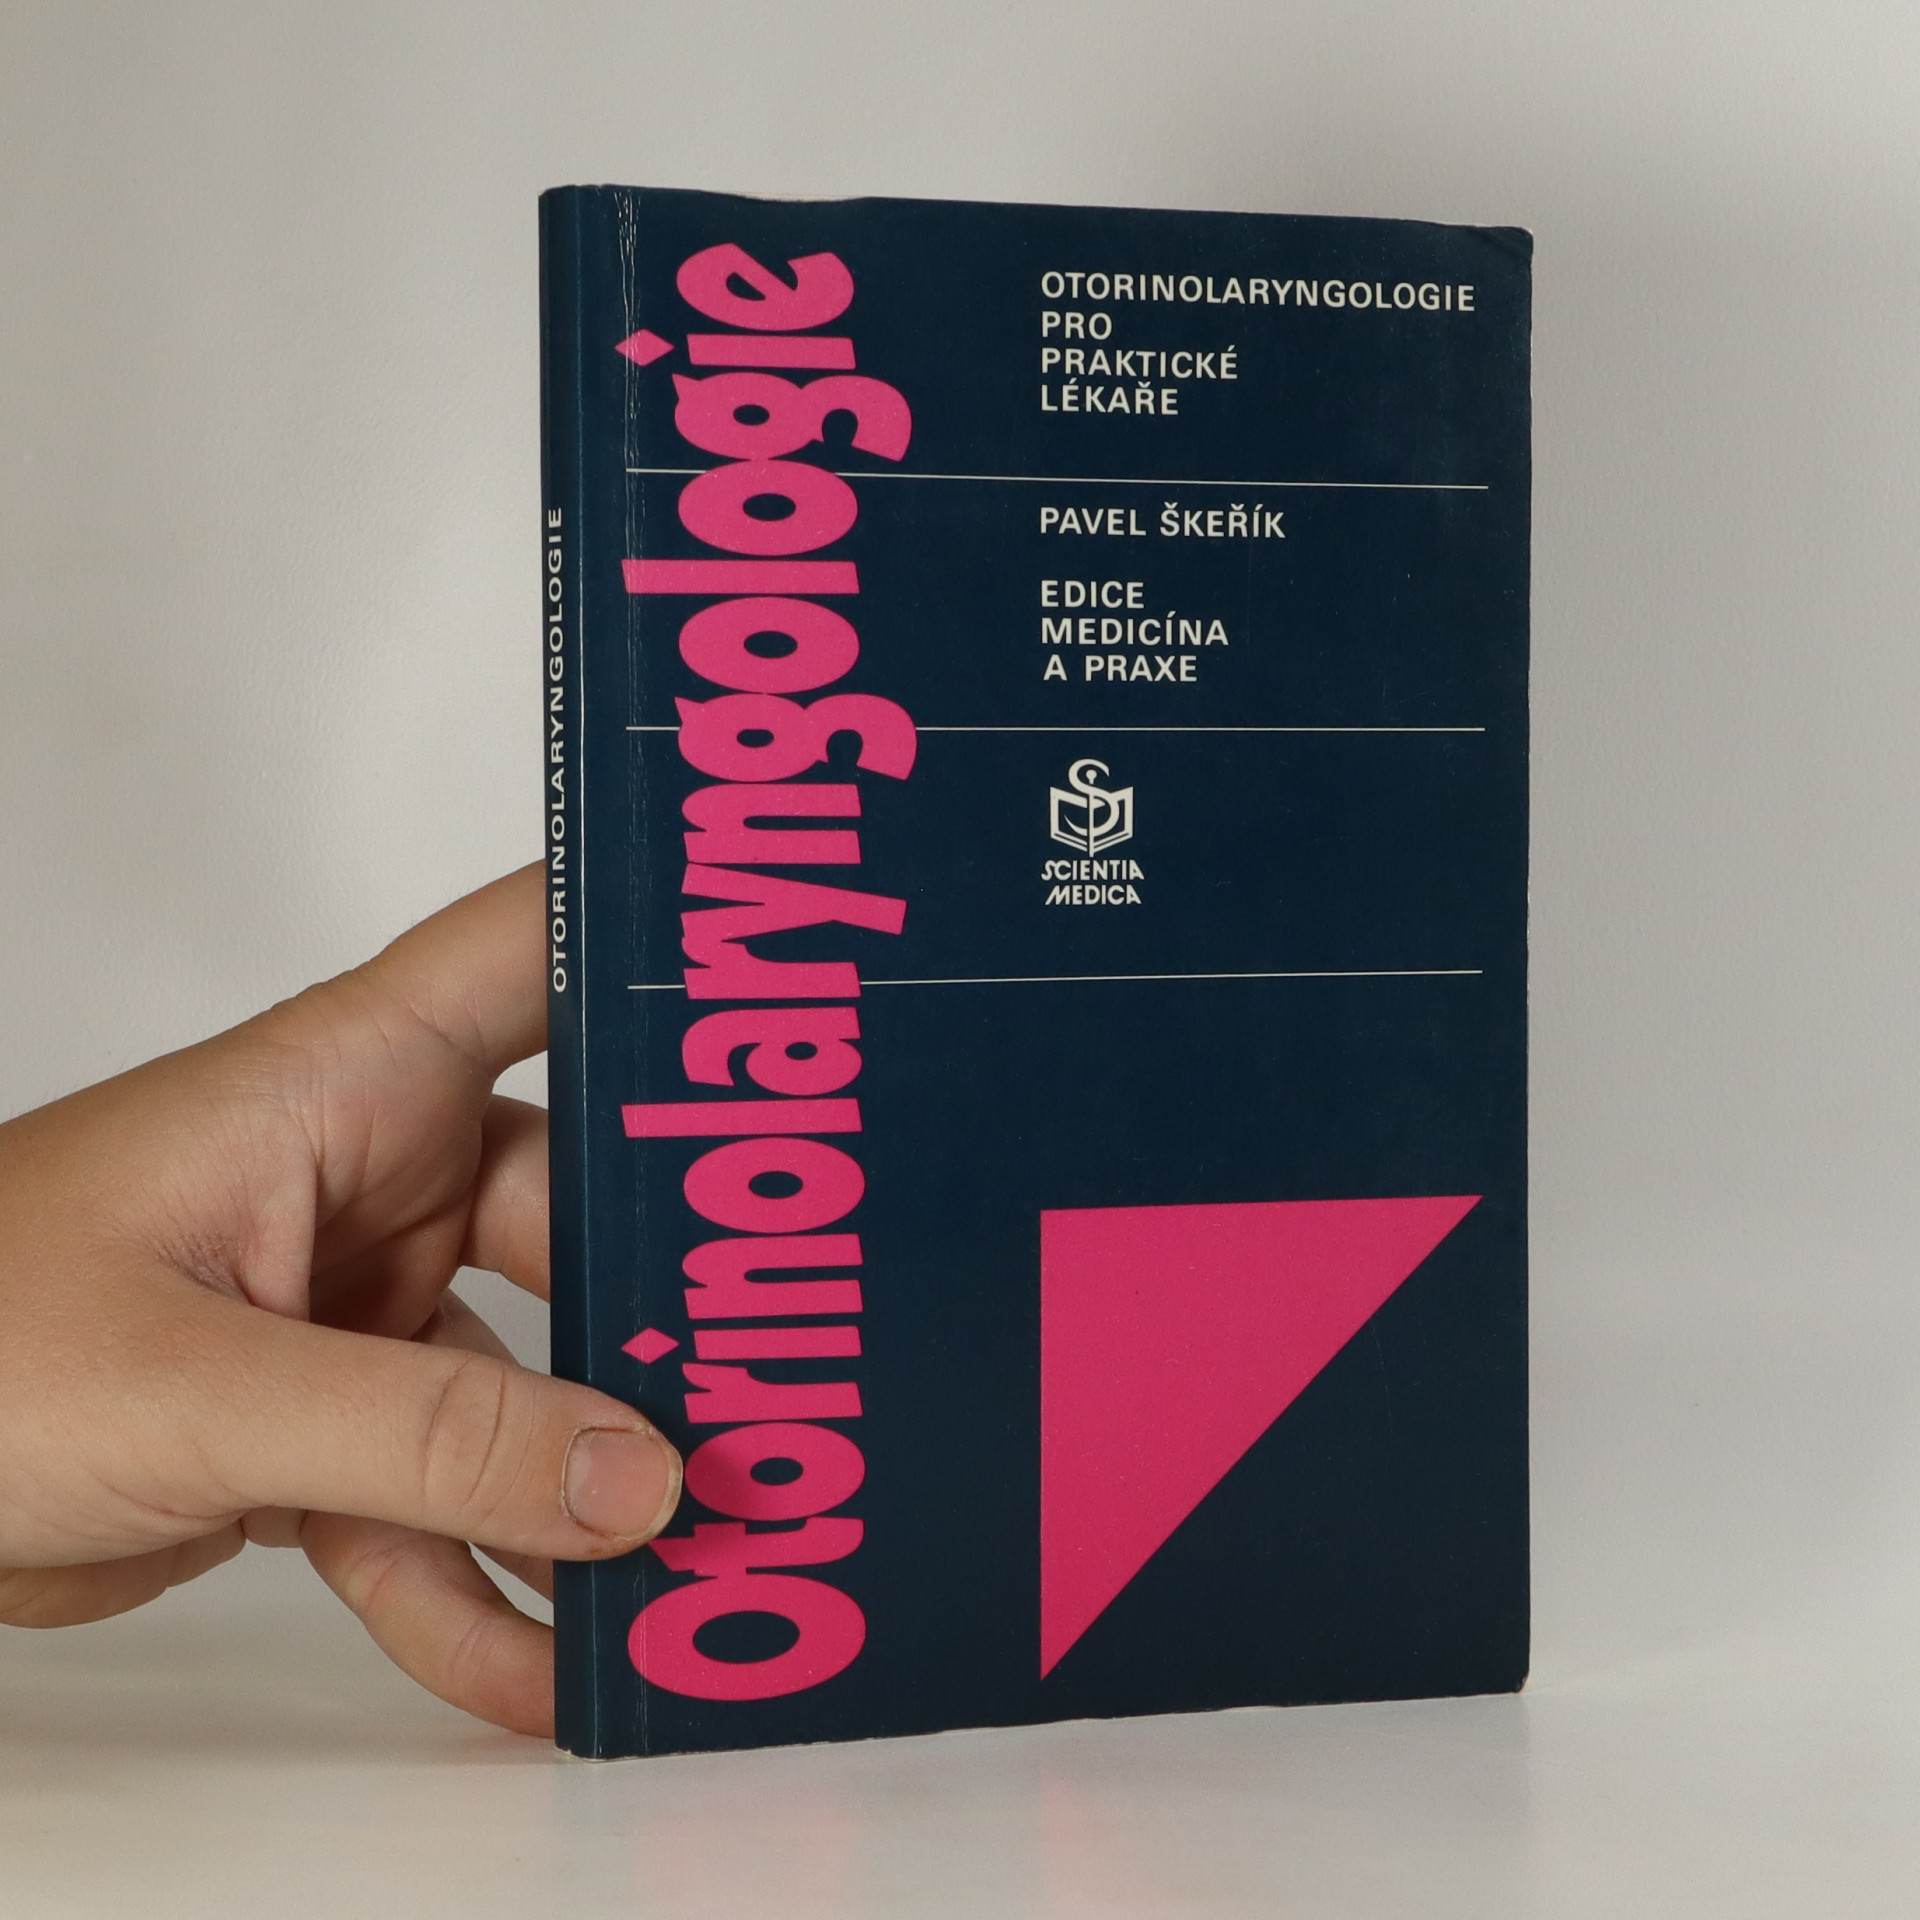 antikvární kniha Otorinolaryngologie pro praktické lékaře, 1993